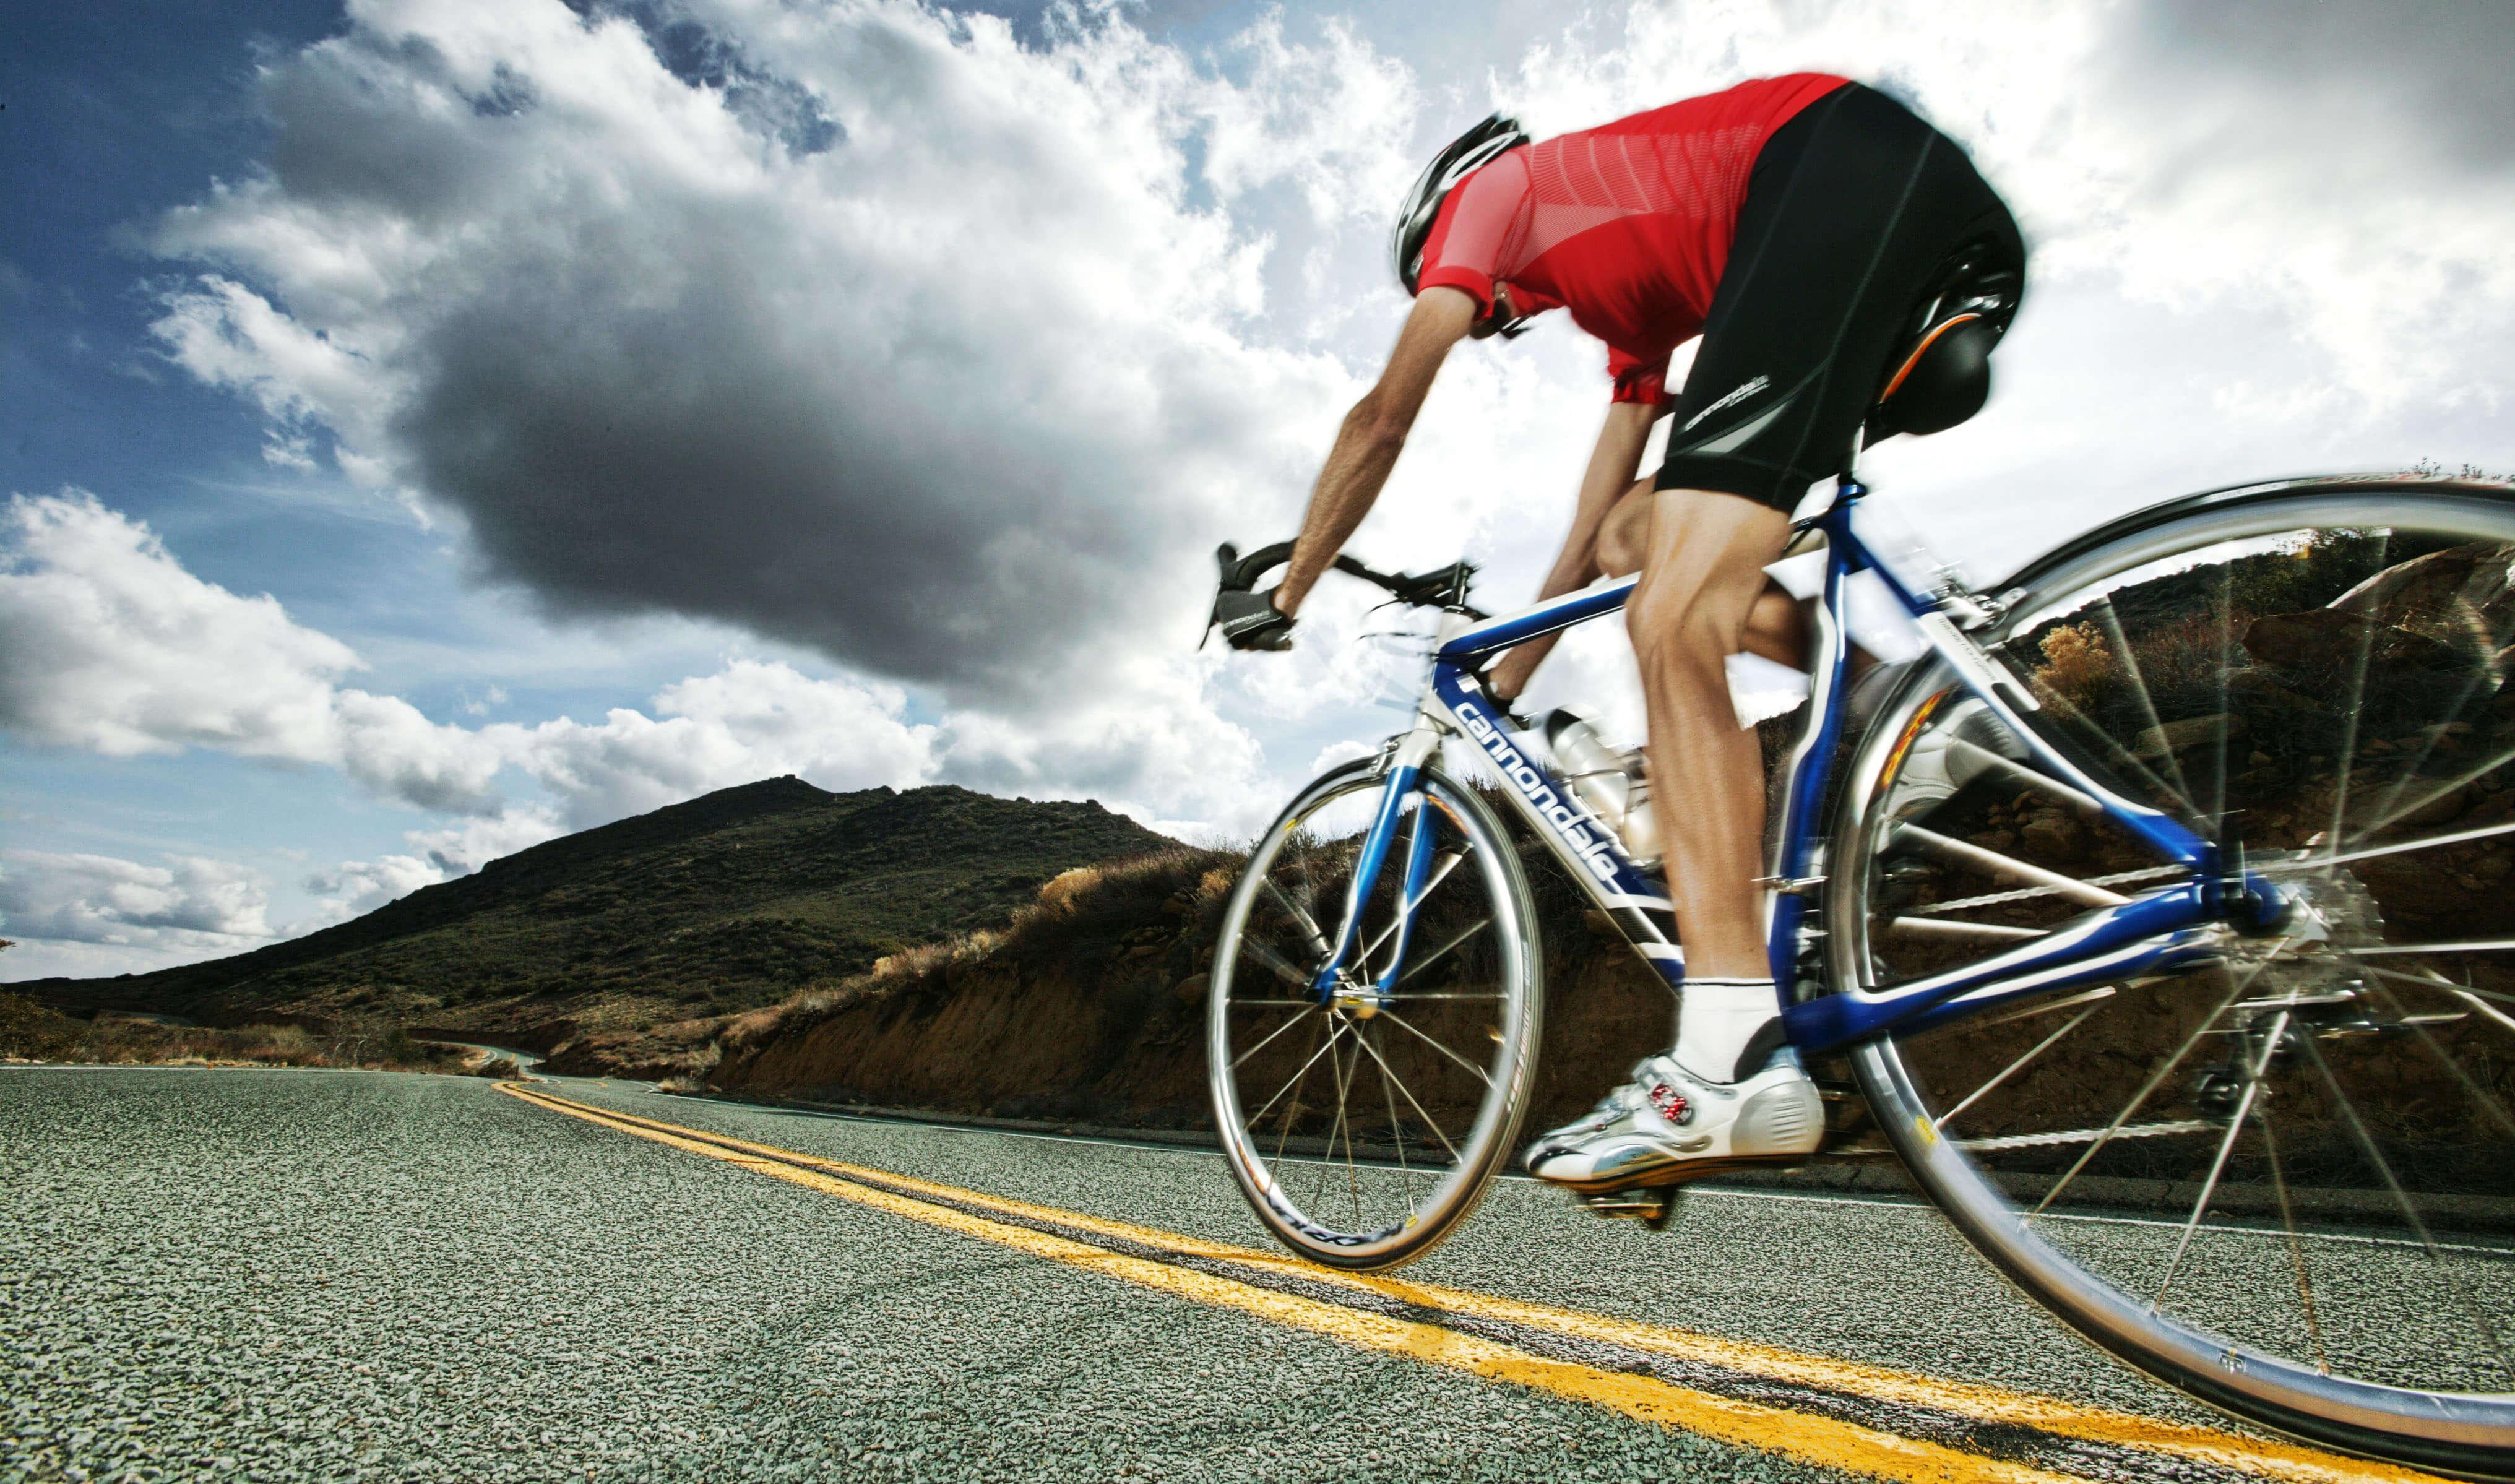 спорт велосипед споротсмен мужчина  № 1633587  скачать